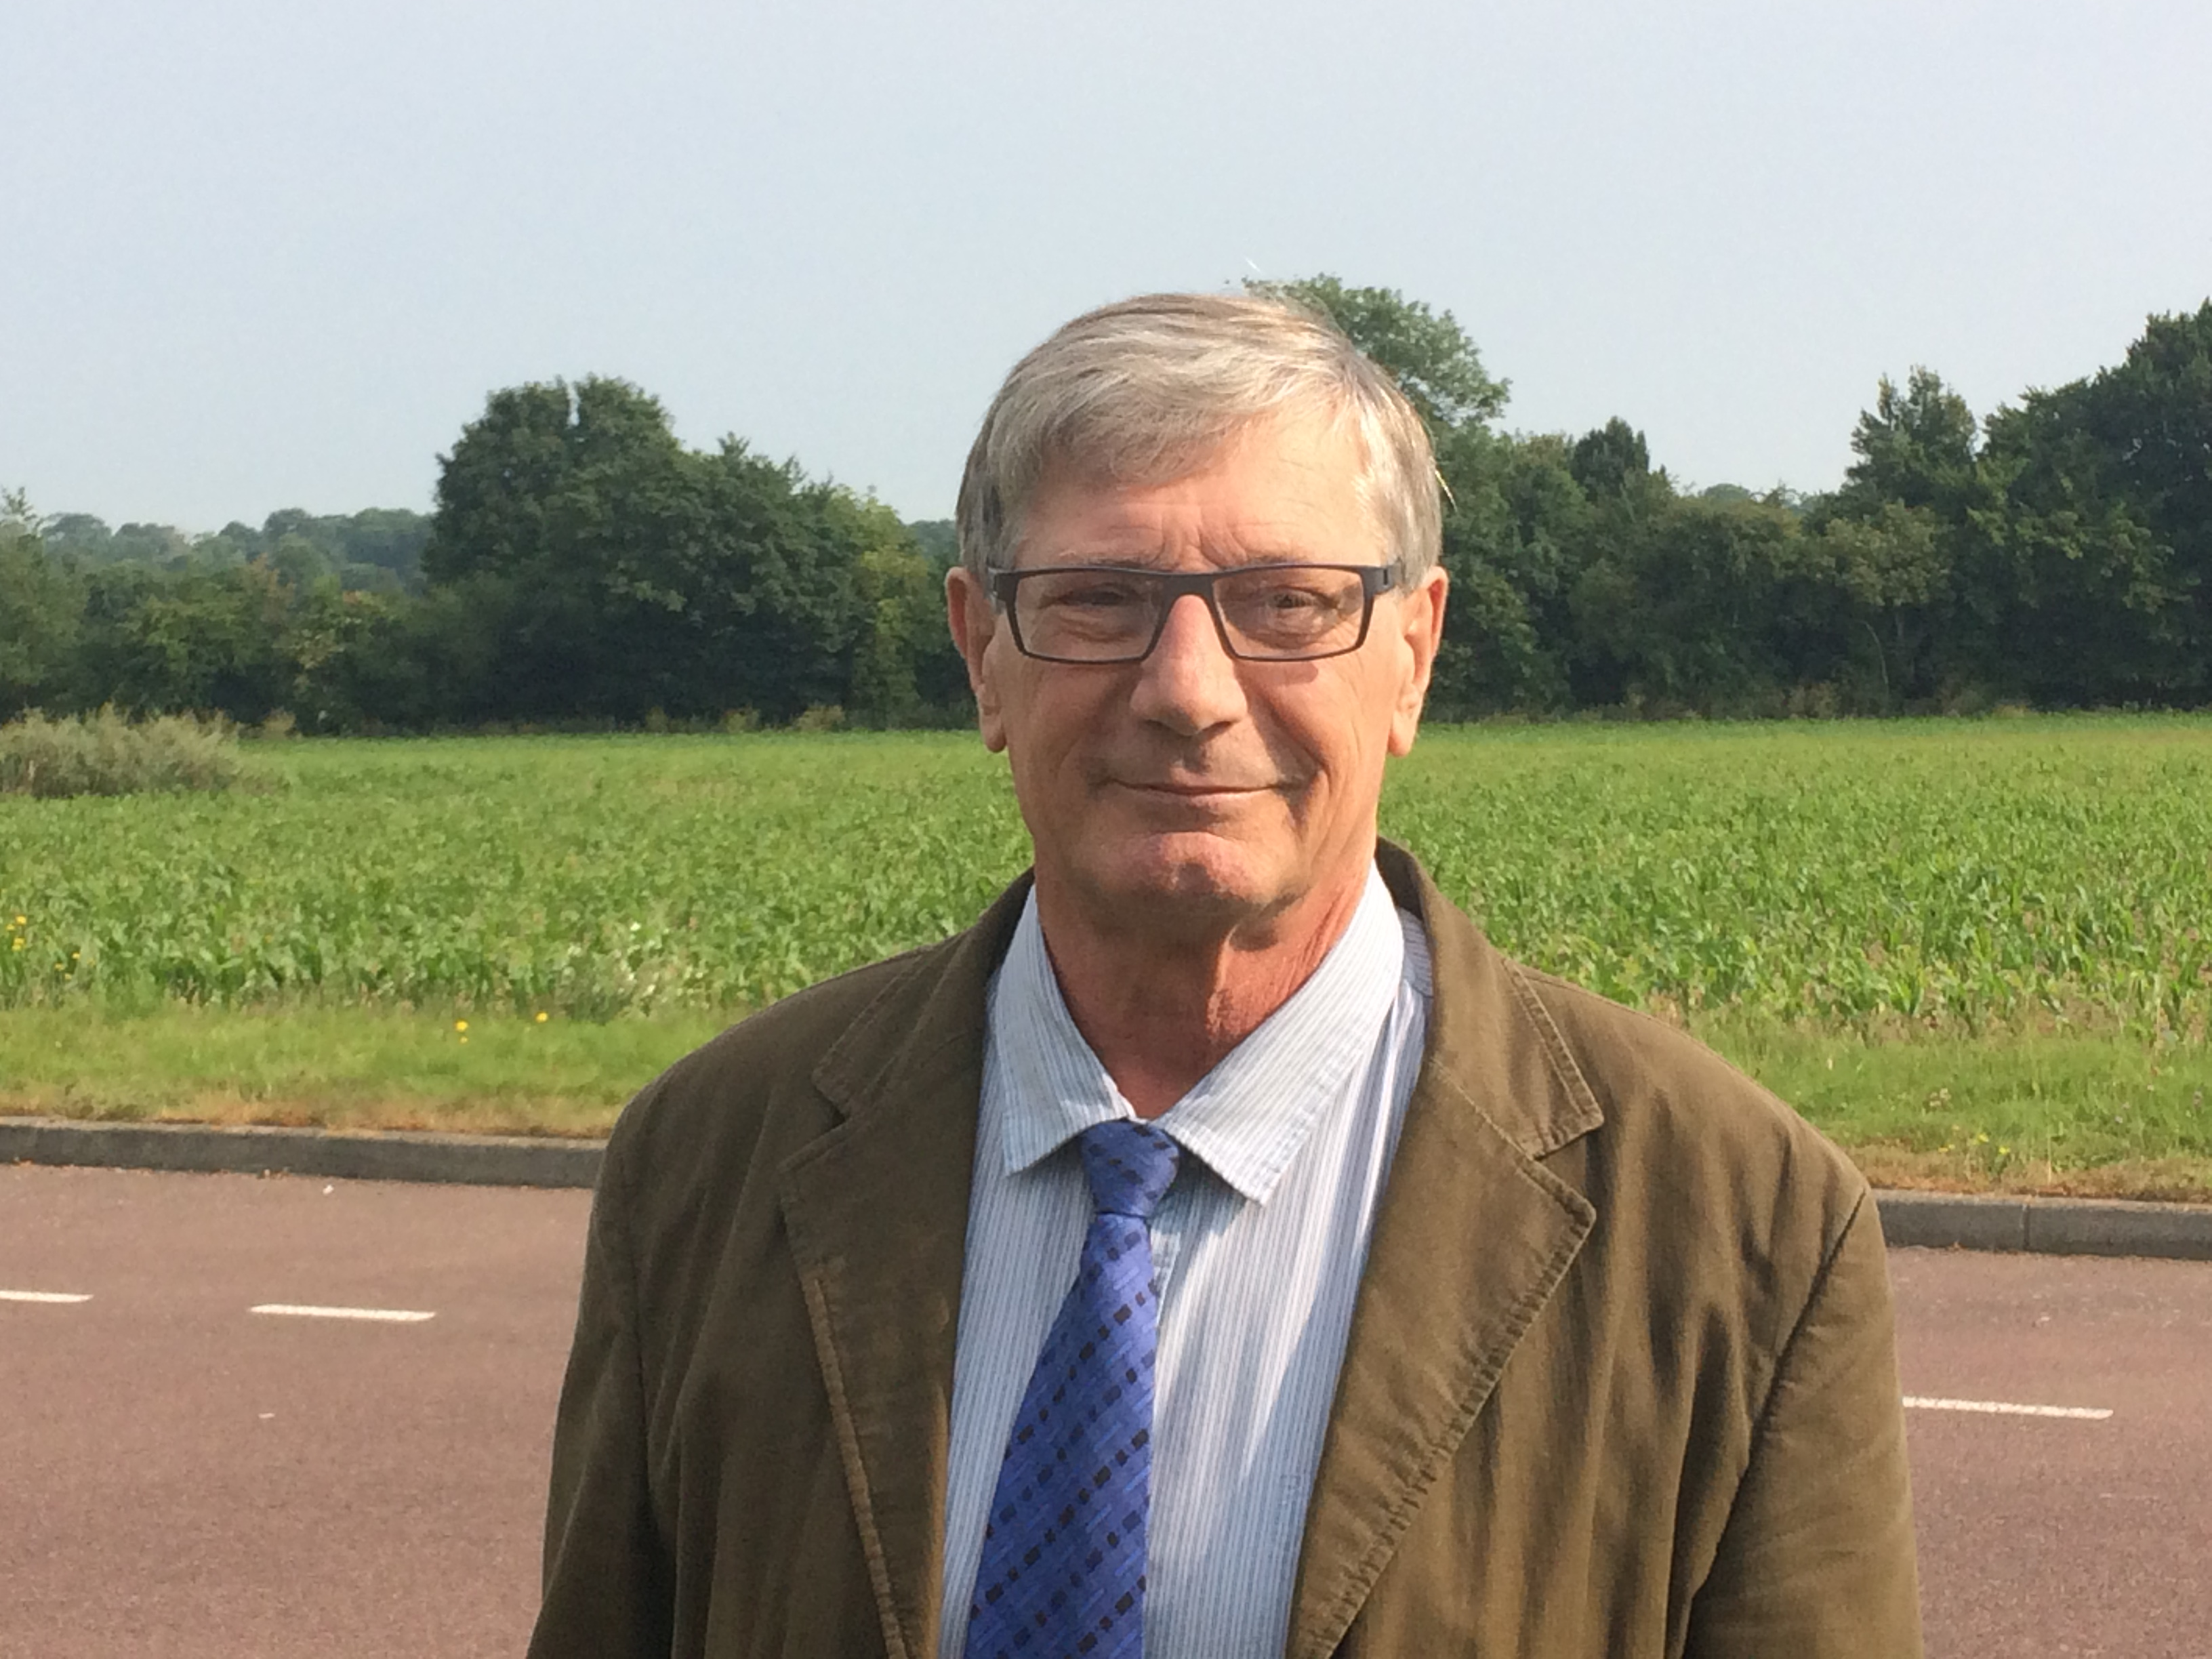 Jean-Noel Guibet